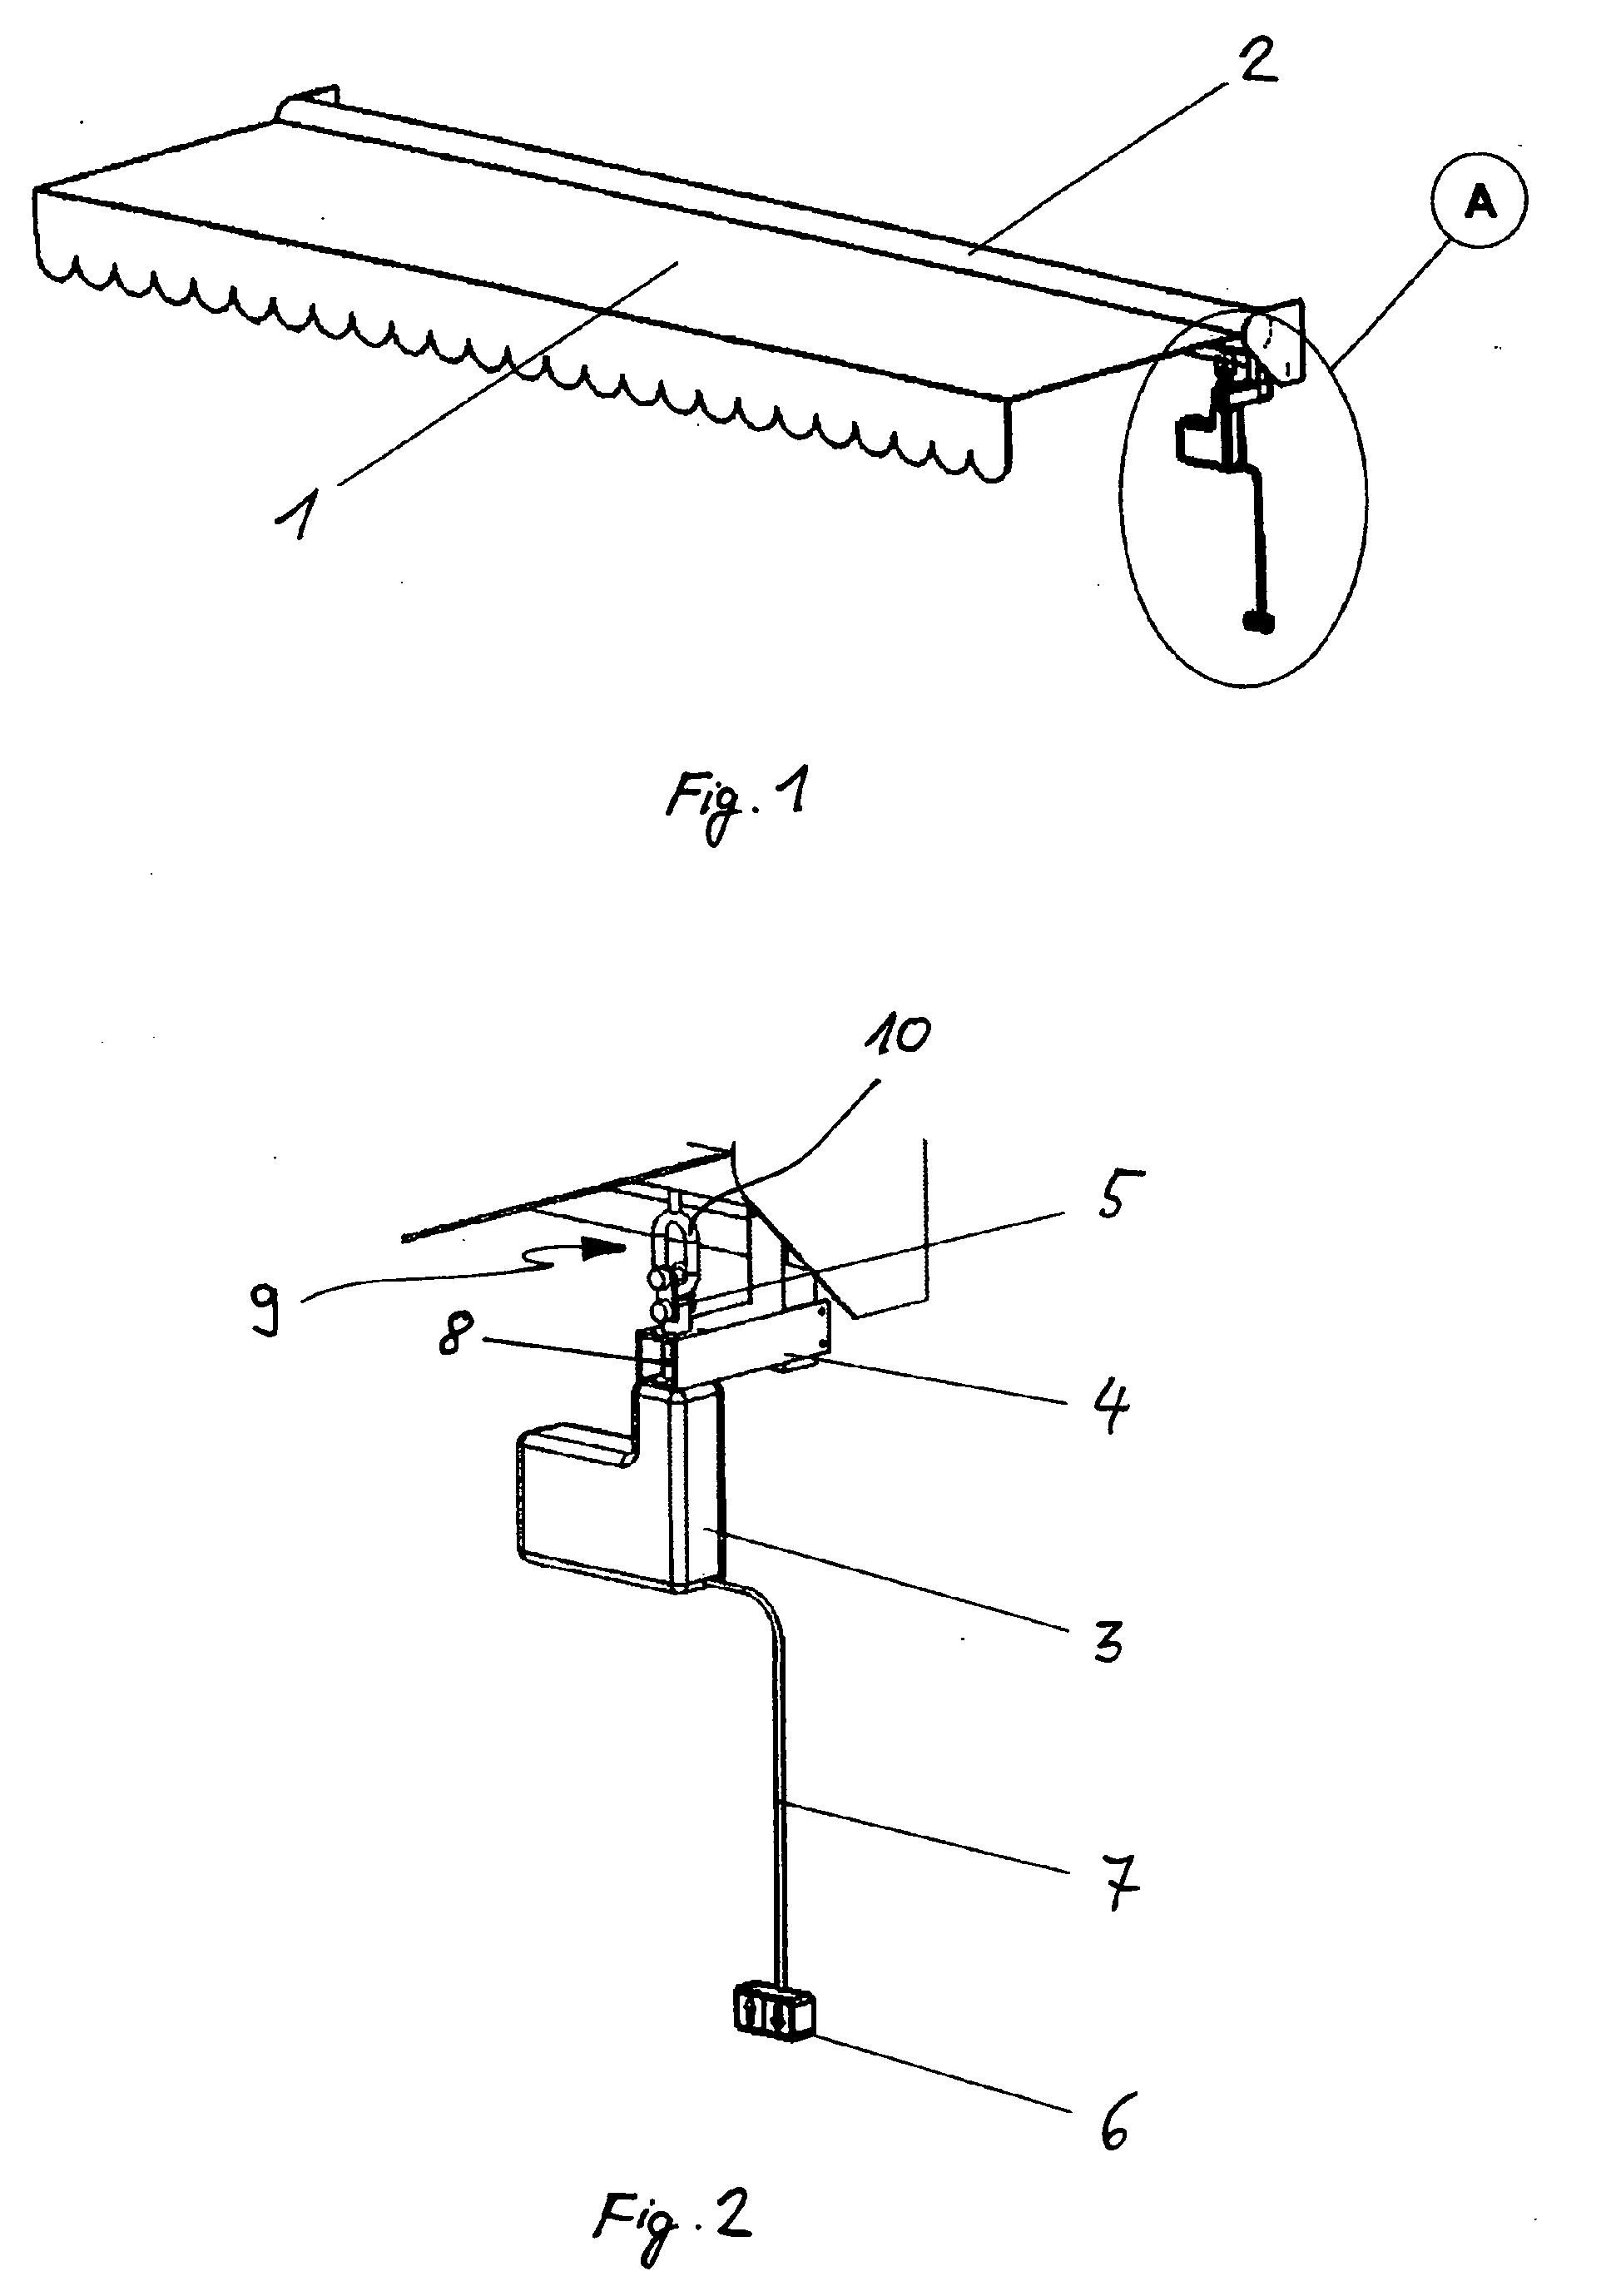 patent ep1577459a2 nachr stbarer markisenantrieb. Black Bedroom Furniture Sets. Home Design Ideas